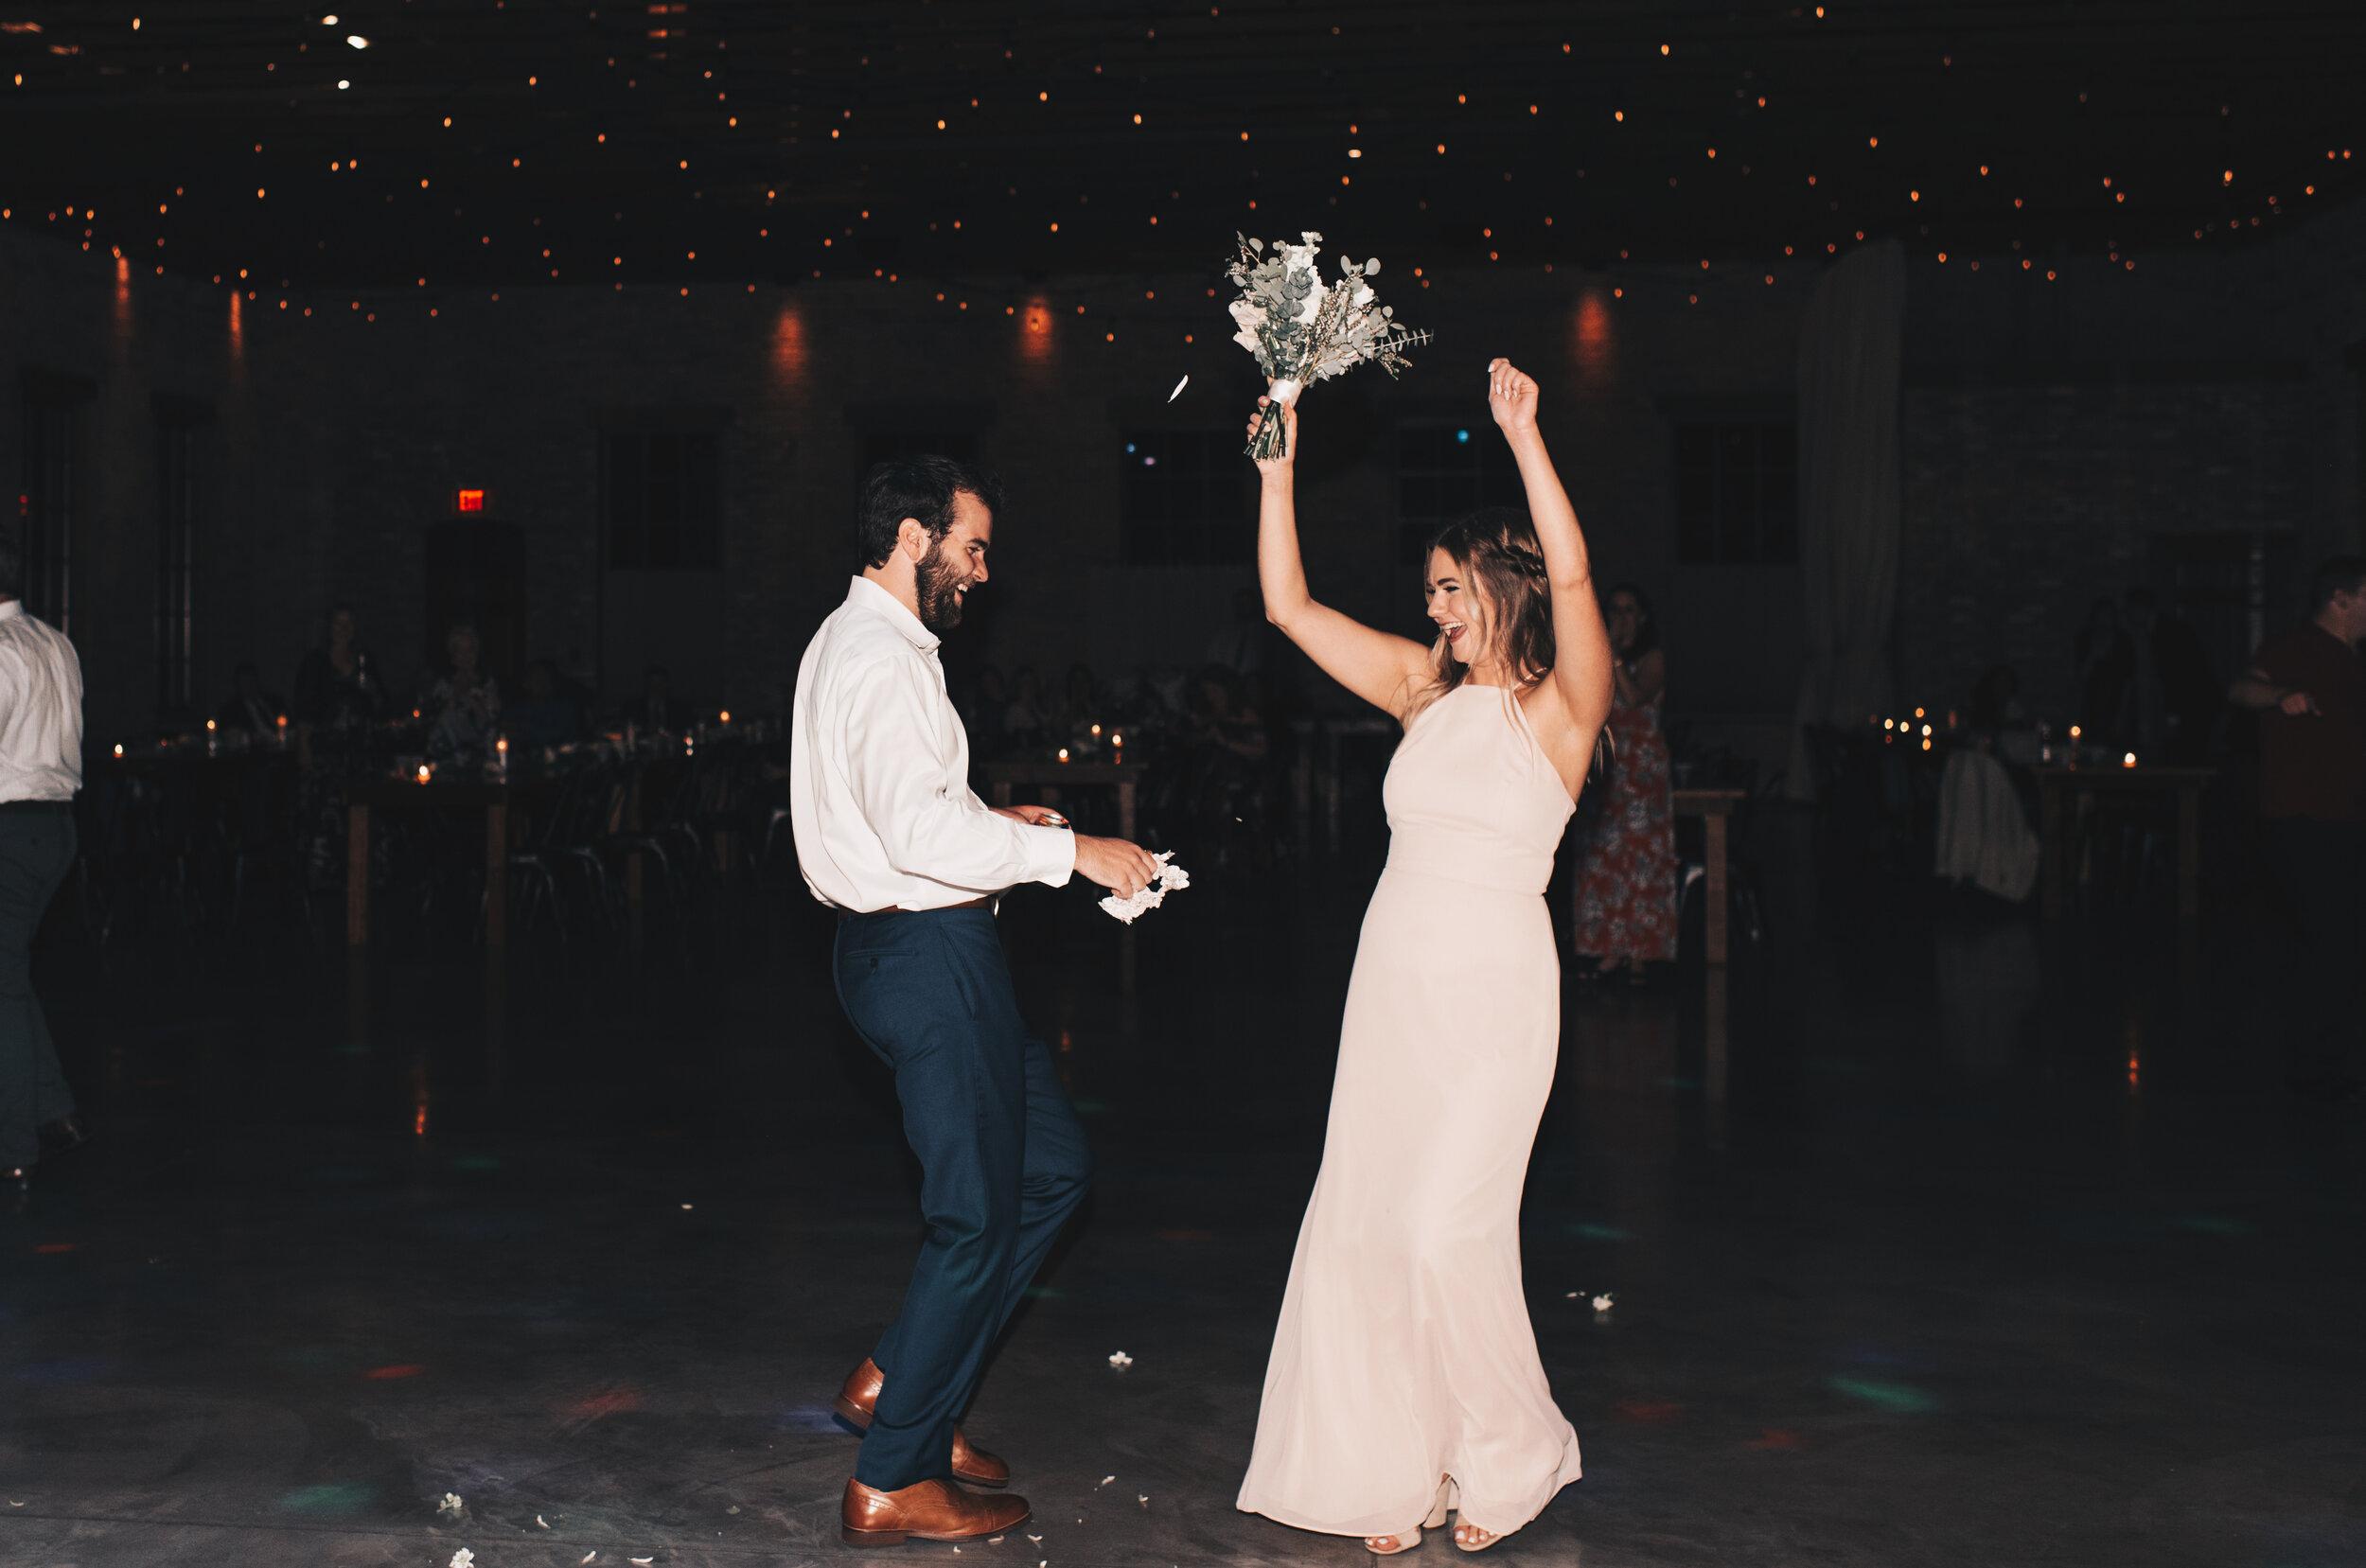 Modern Industrial Wedding, The Brix on the Fox, The BRIX, Chicago Industrial Wedding, Modern Midwest Wedding, The Brix on the Fox Wedding, The BRIX Wedding, Wedding Dancing Photos